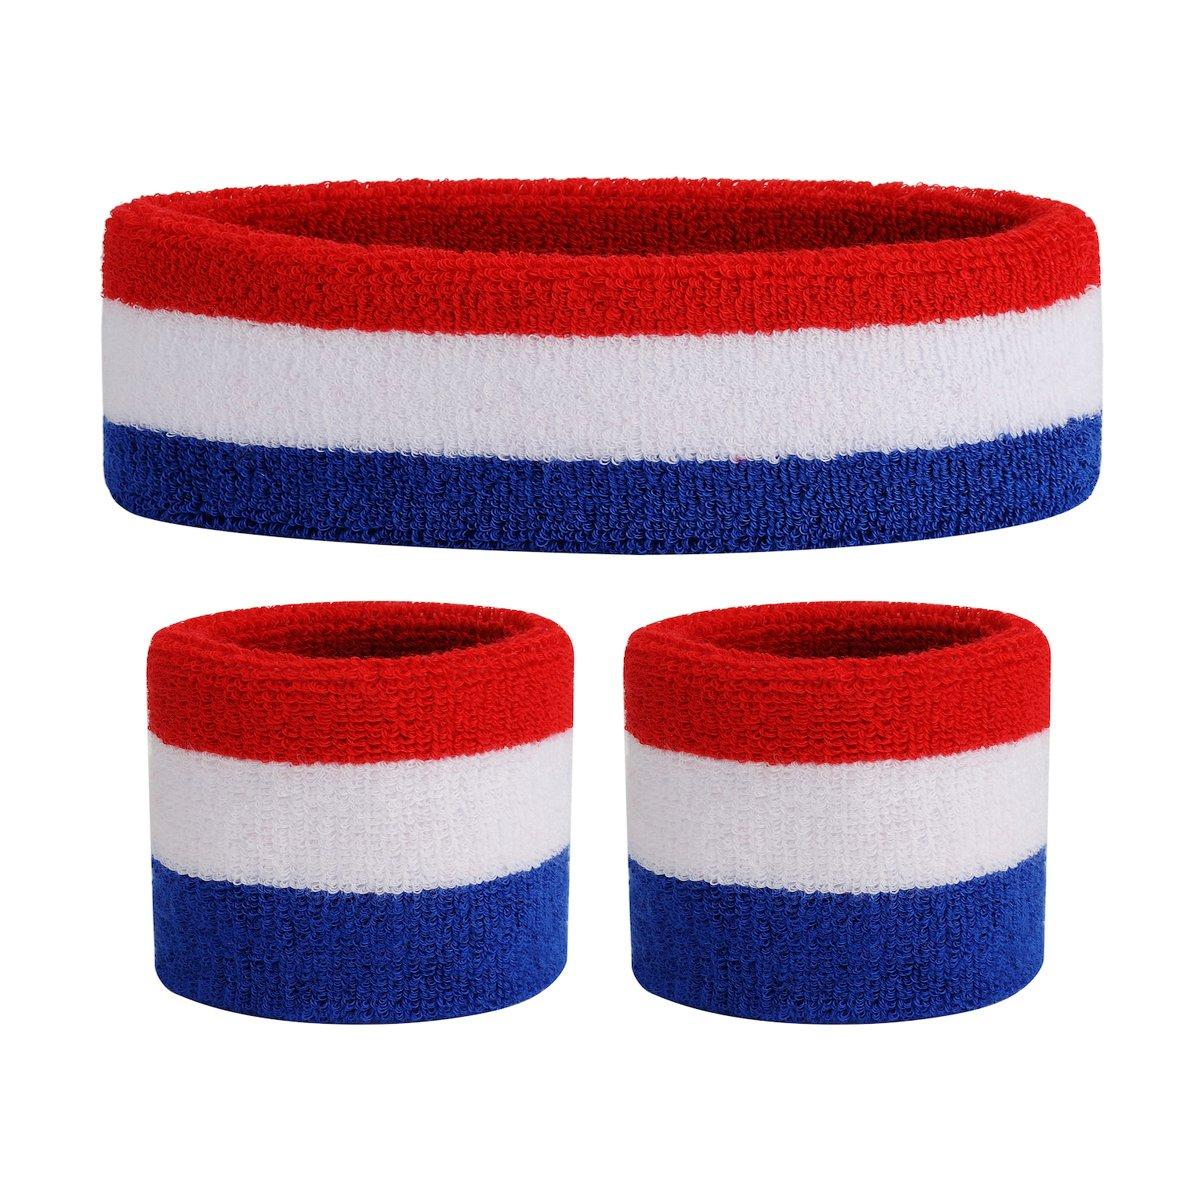 ONUPGO Kids Head Sweatband Wristband Set - Athletic Cotton Terry Cloth Headbands for Sports (1 Headband + 2 Wristbands)